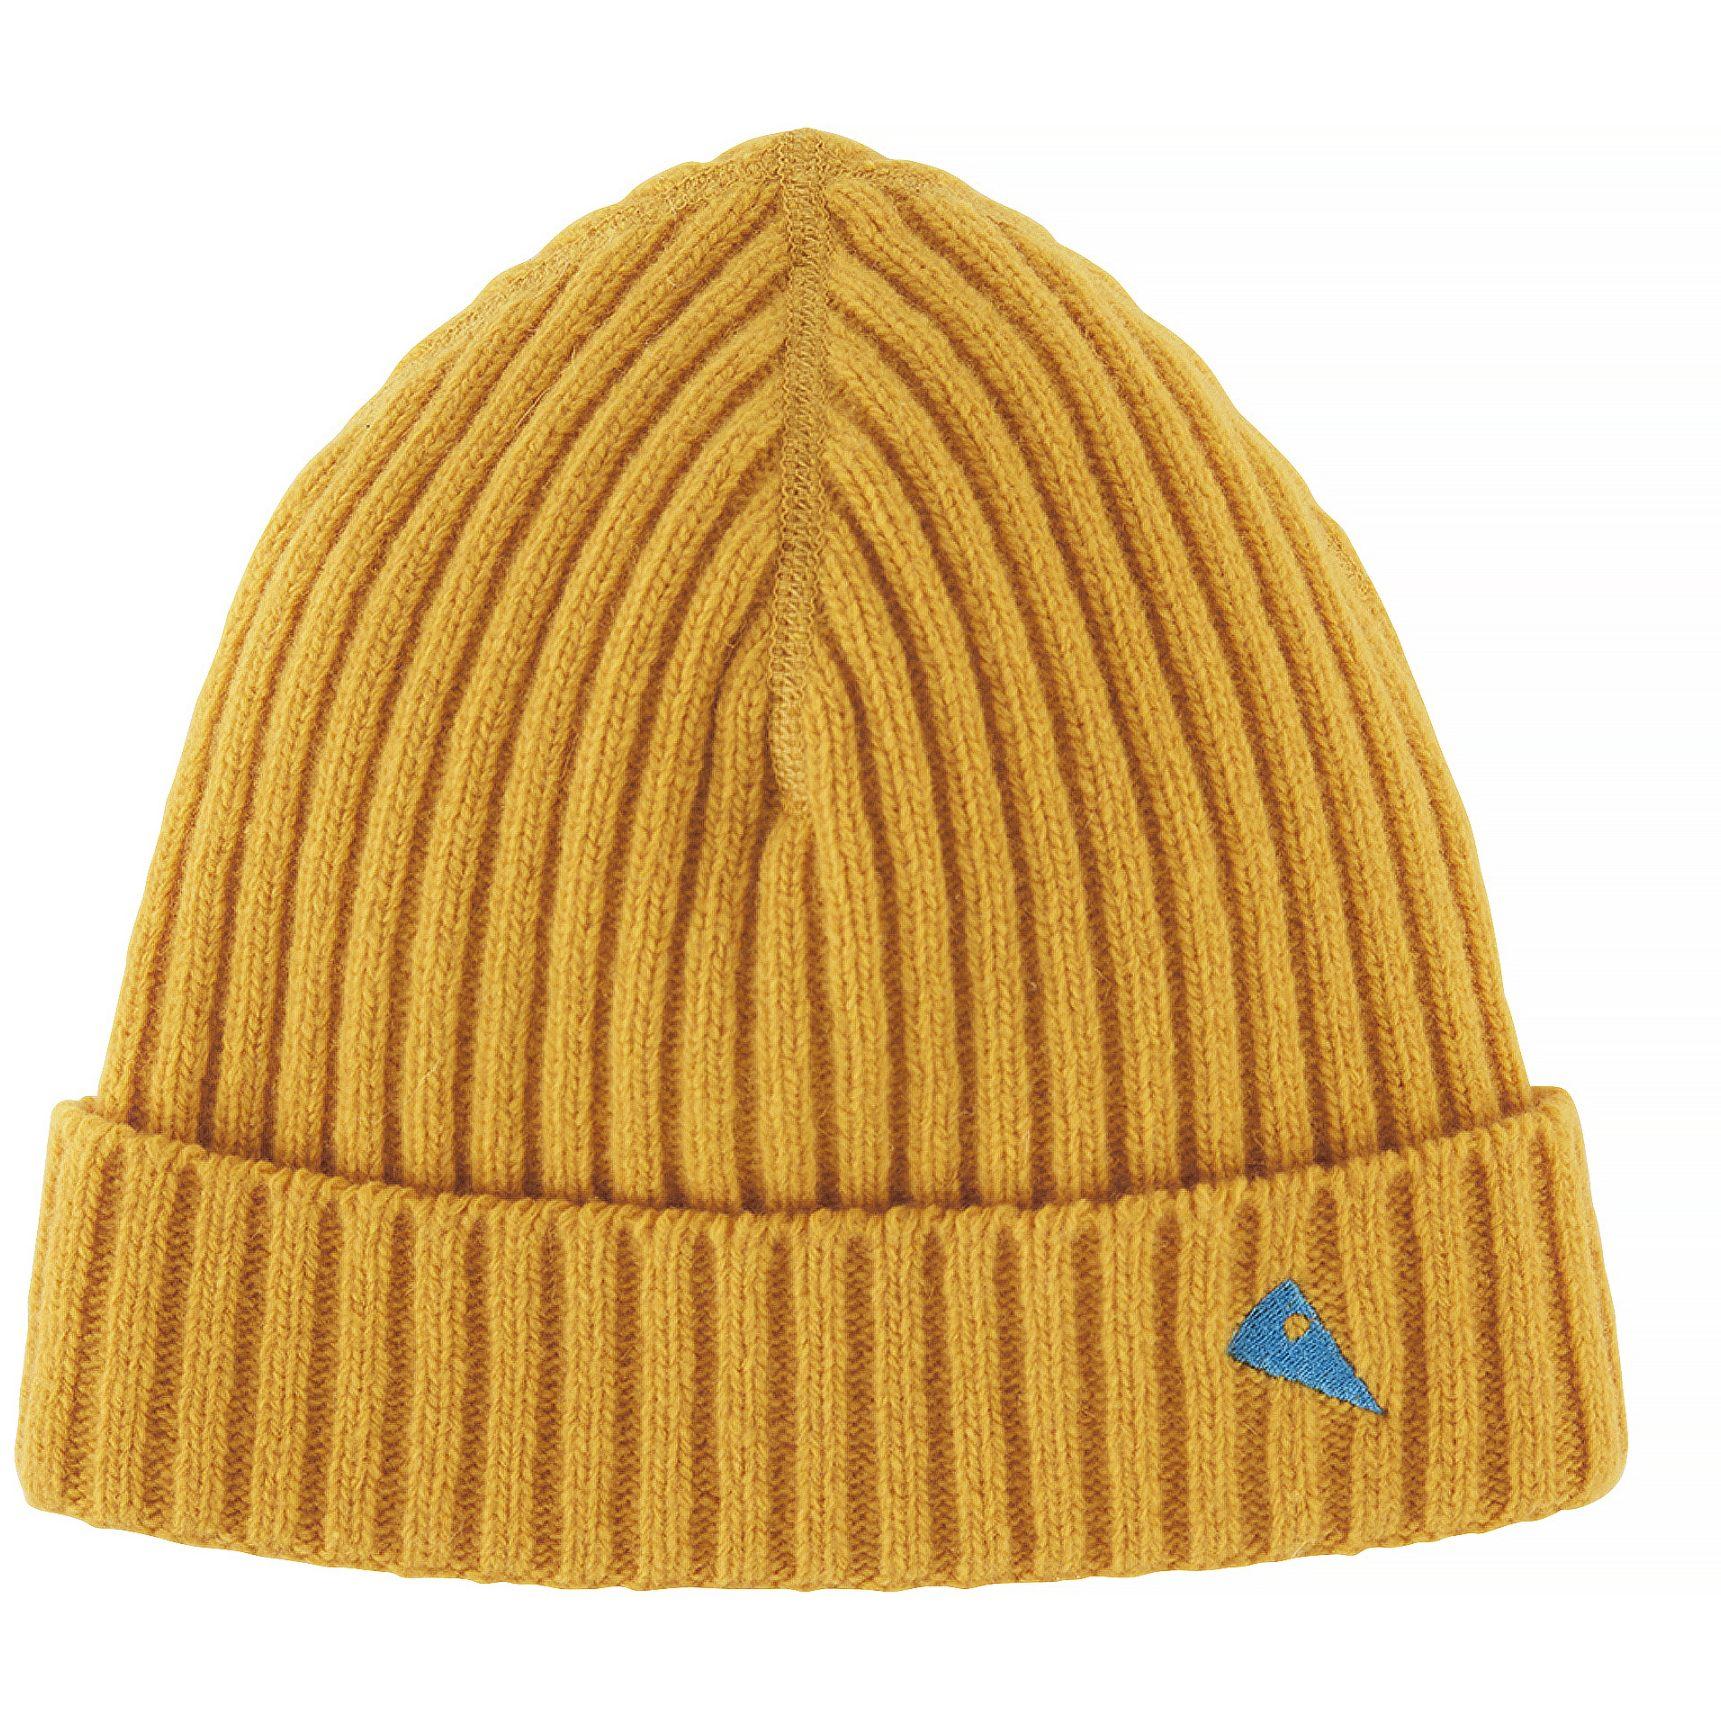 Picture of Klättermusen Barre Ribbed Cap - Sun Yellow